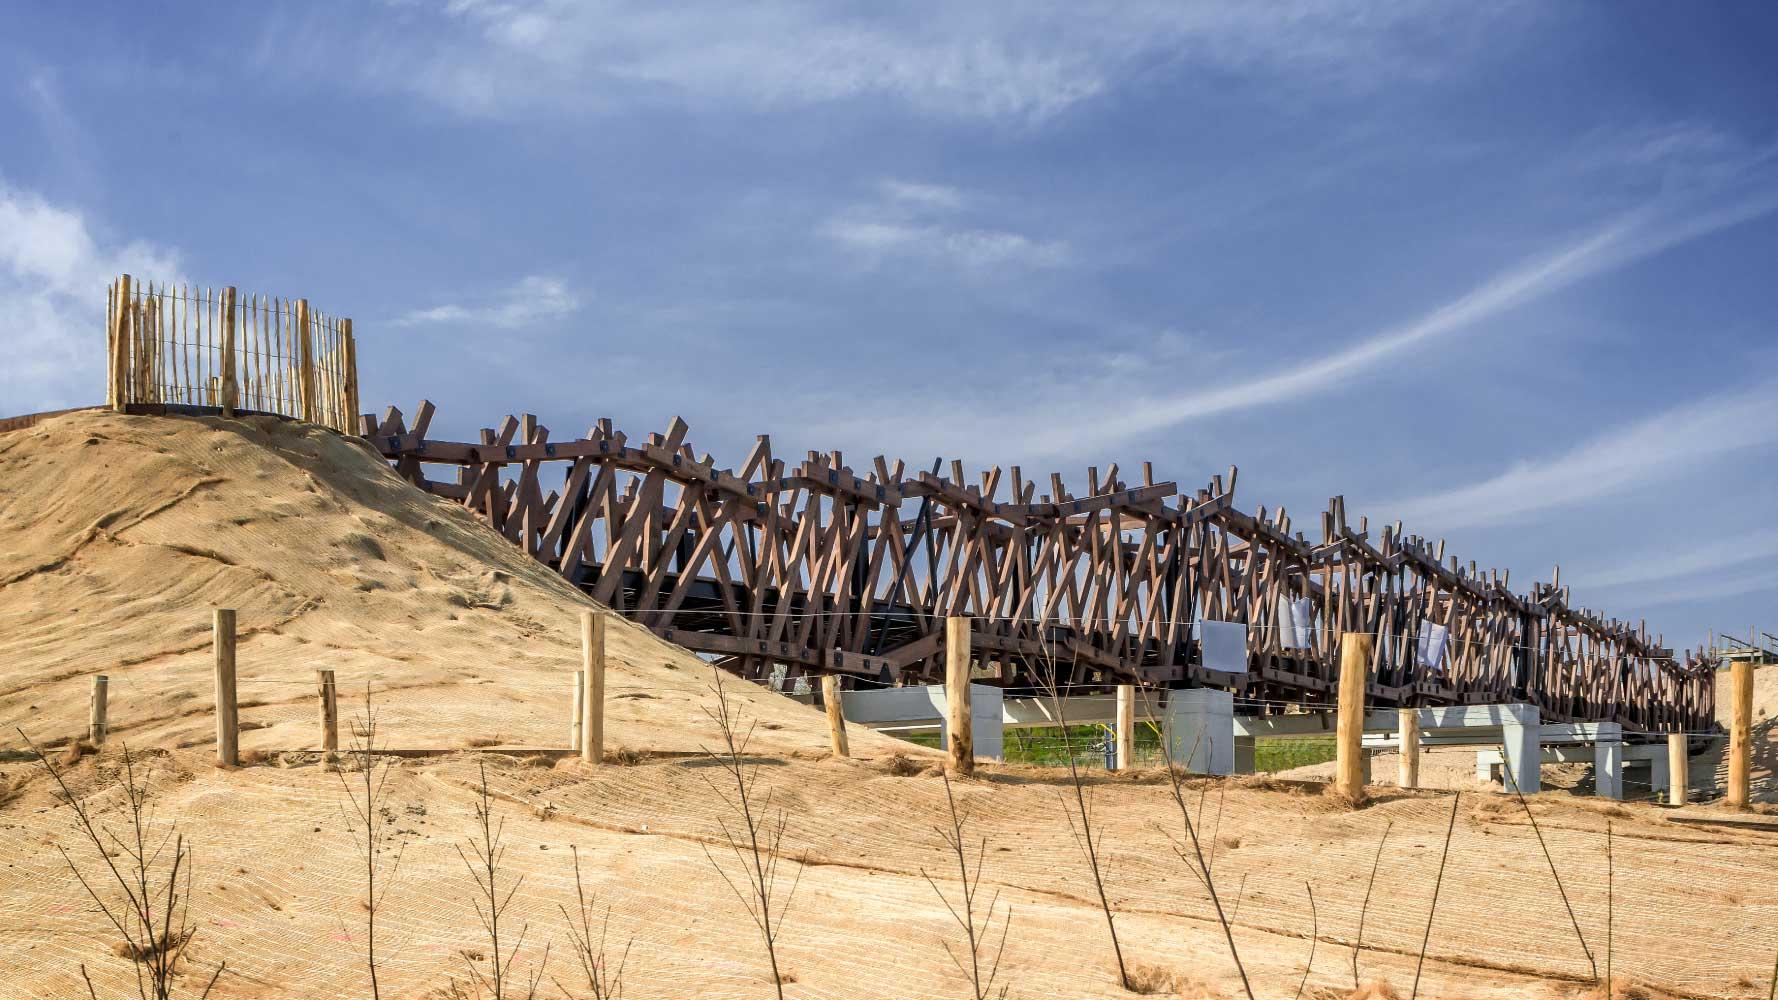 Voetgangersbrug 'Het Wrakhout' Wenduine